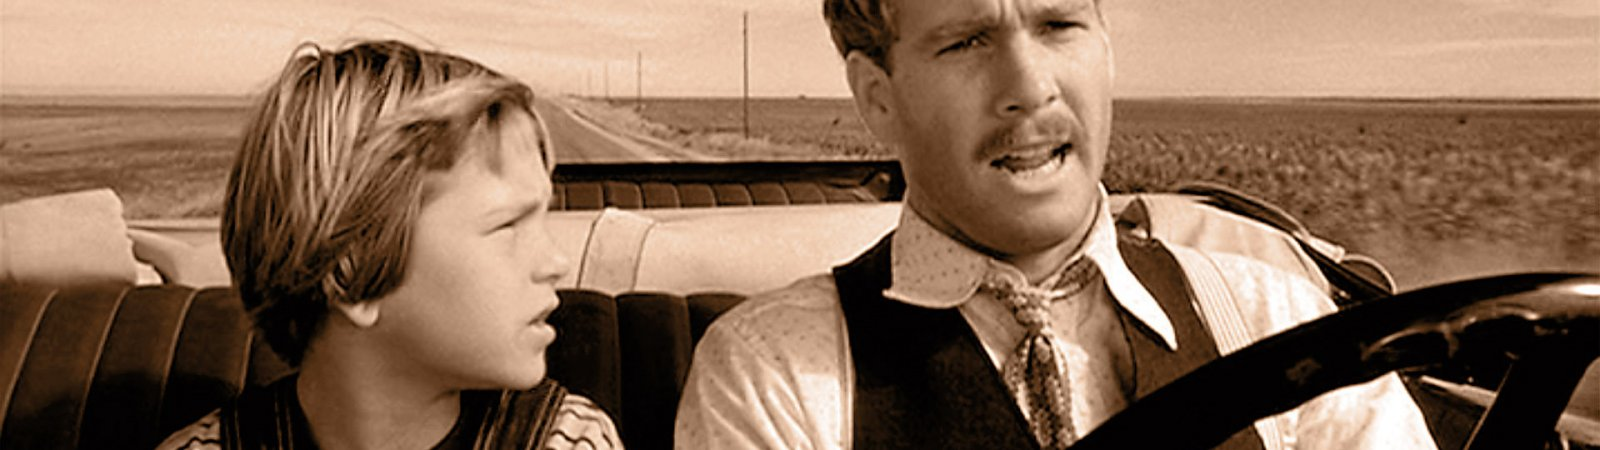 Photo dernier film  P.j. Johnson